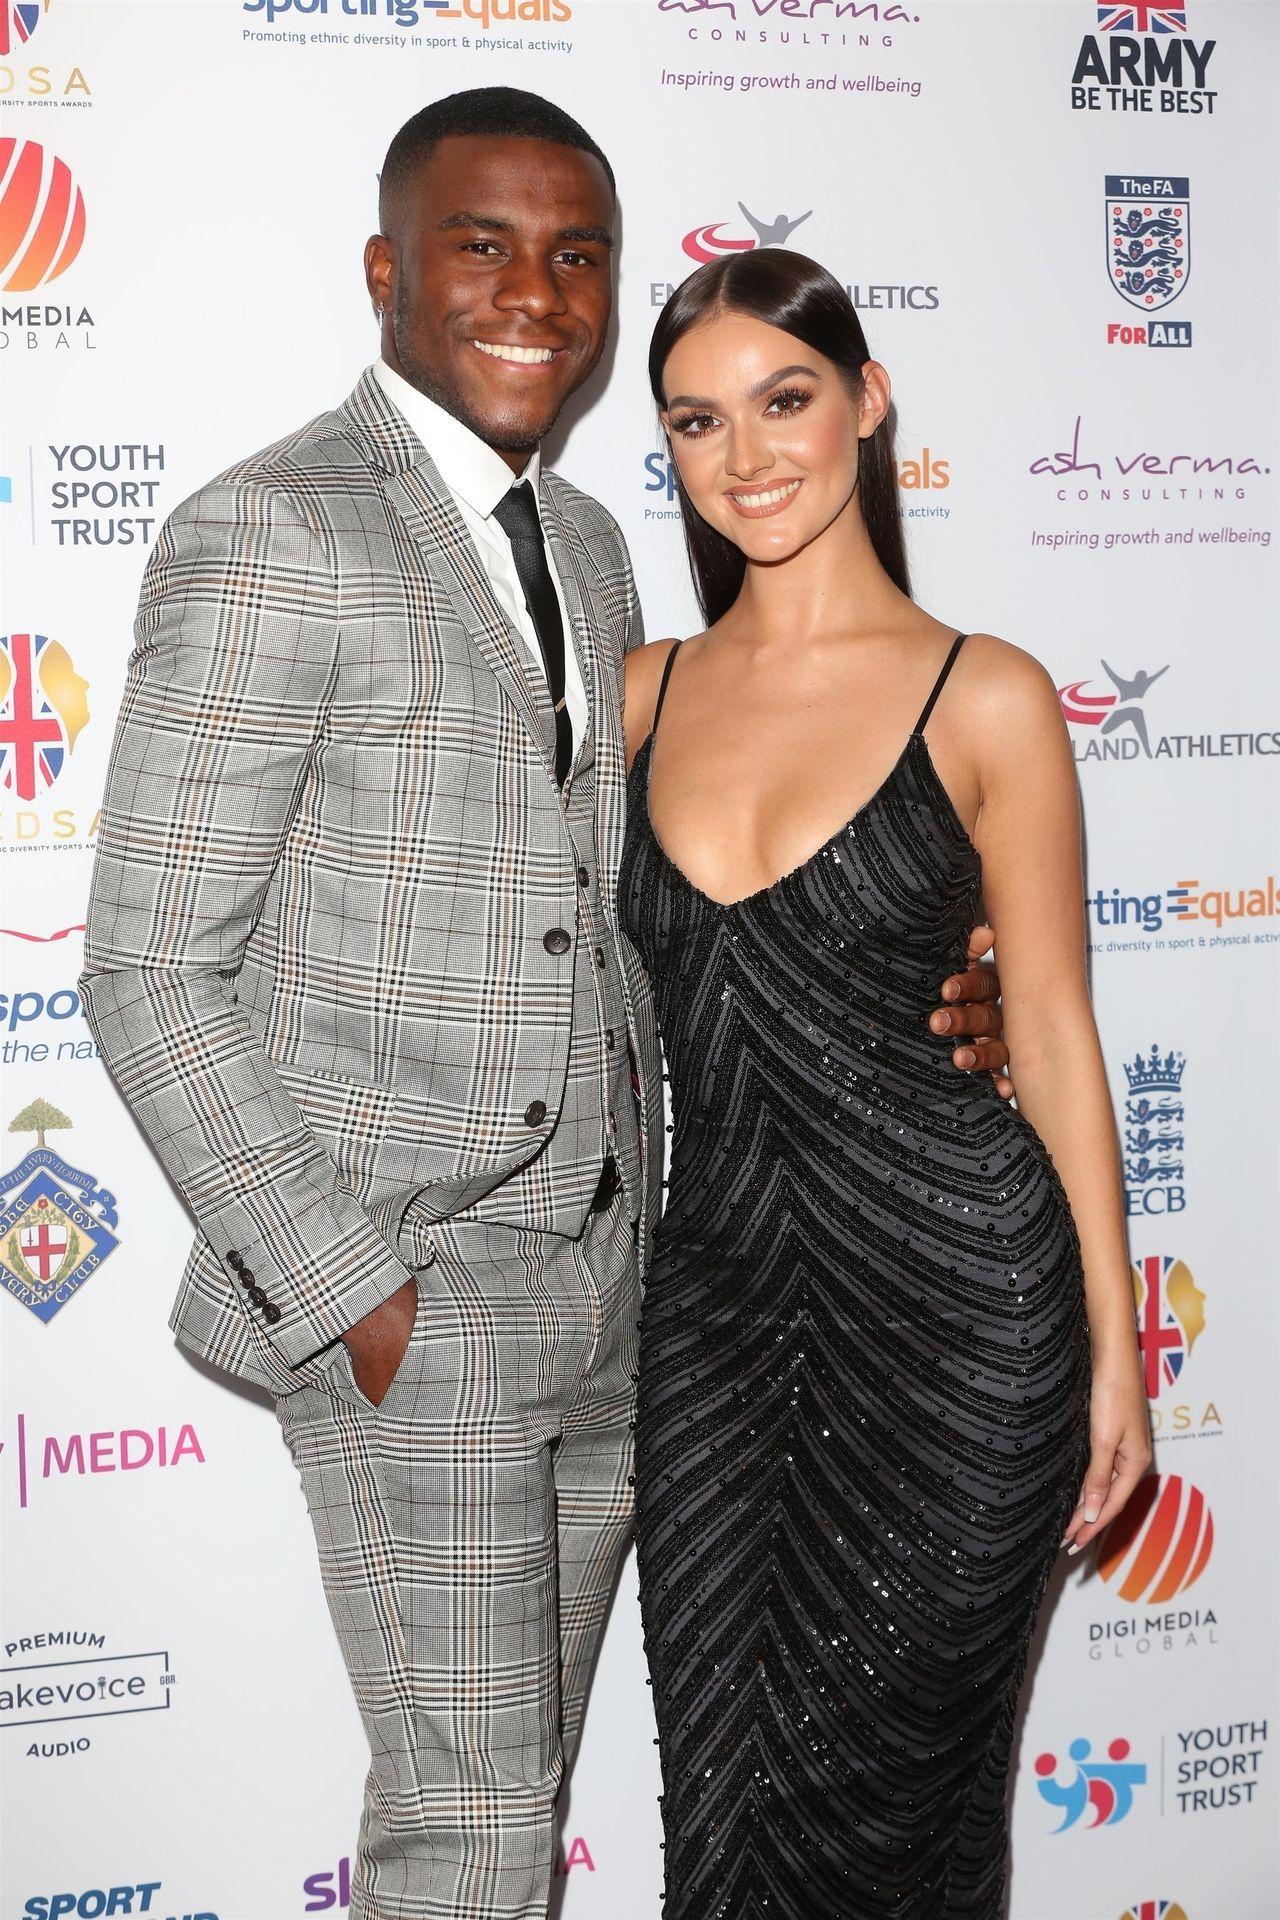 Siannise Fudge & Luke Trotman Are Seen At British Ethnic Diversity Sports Awards 0047